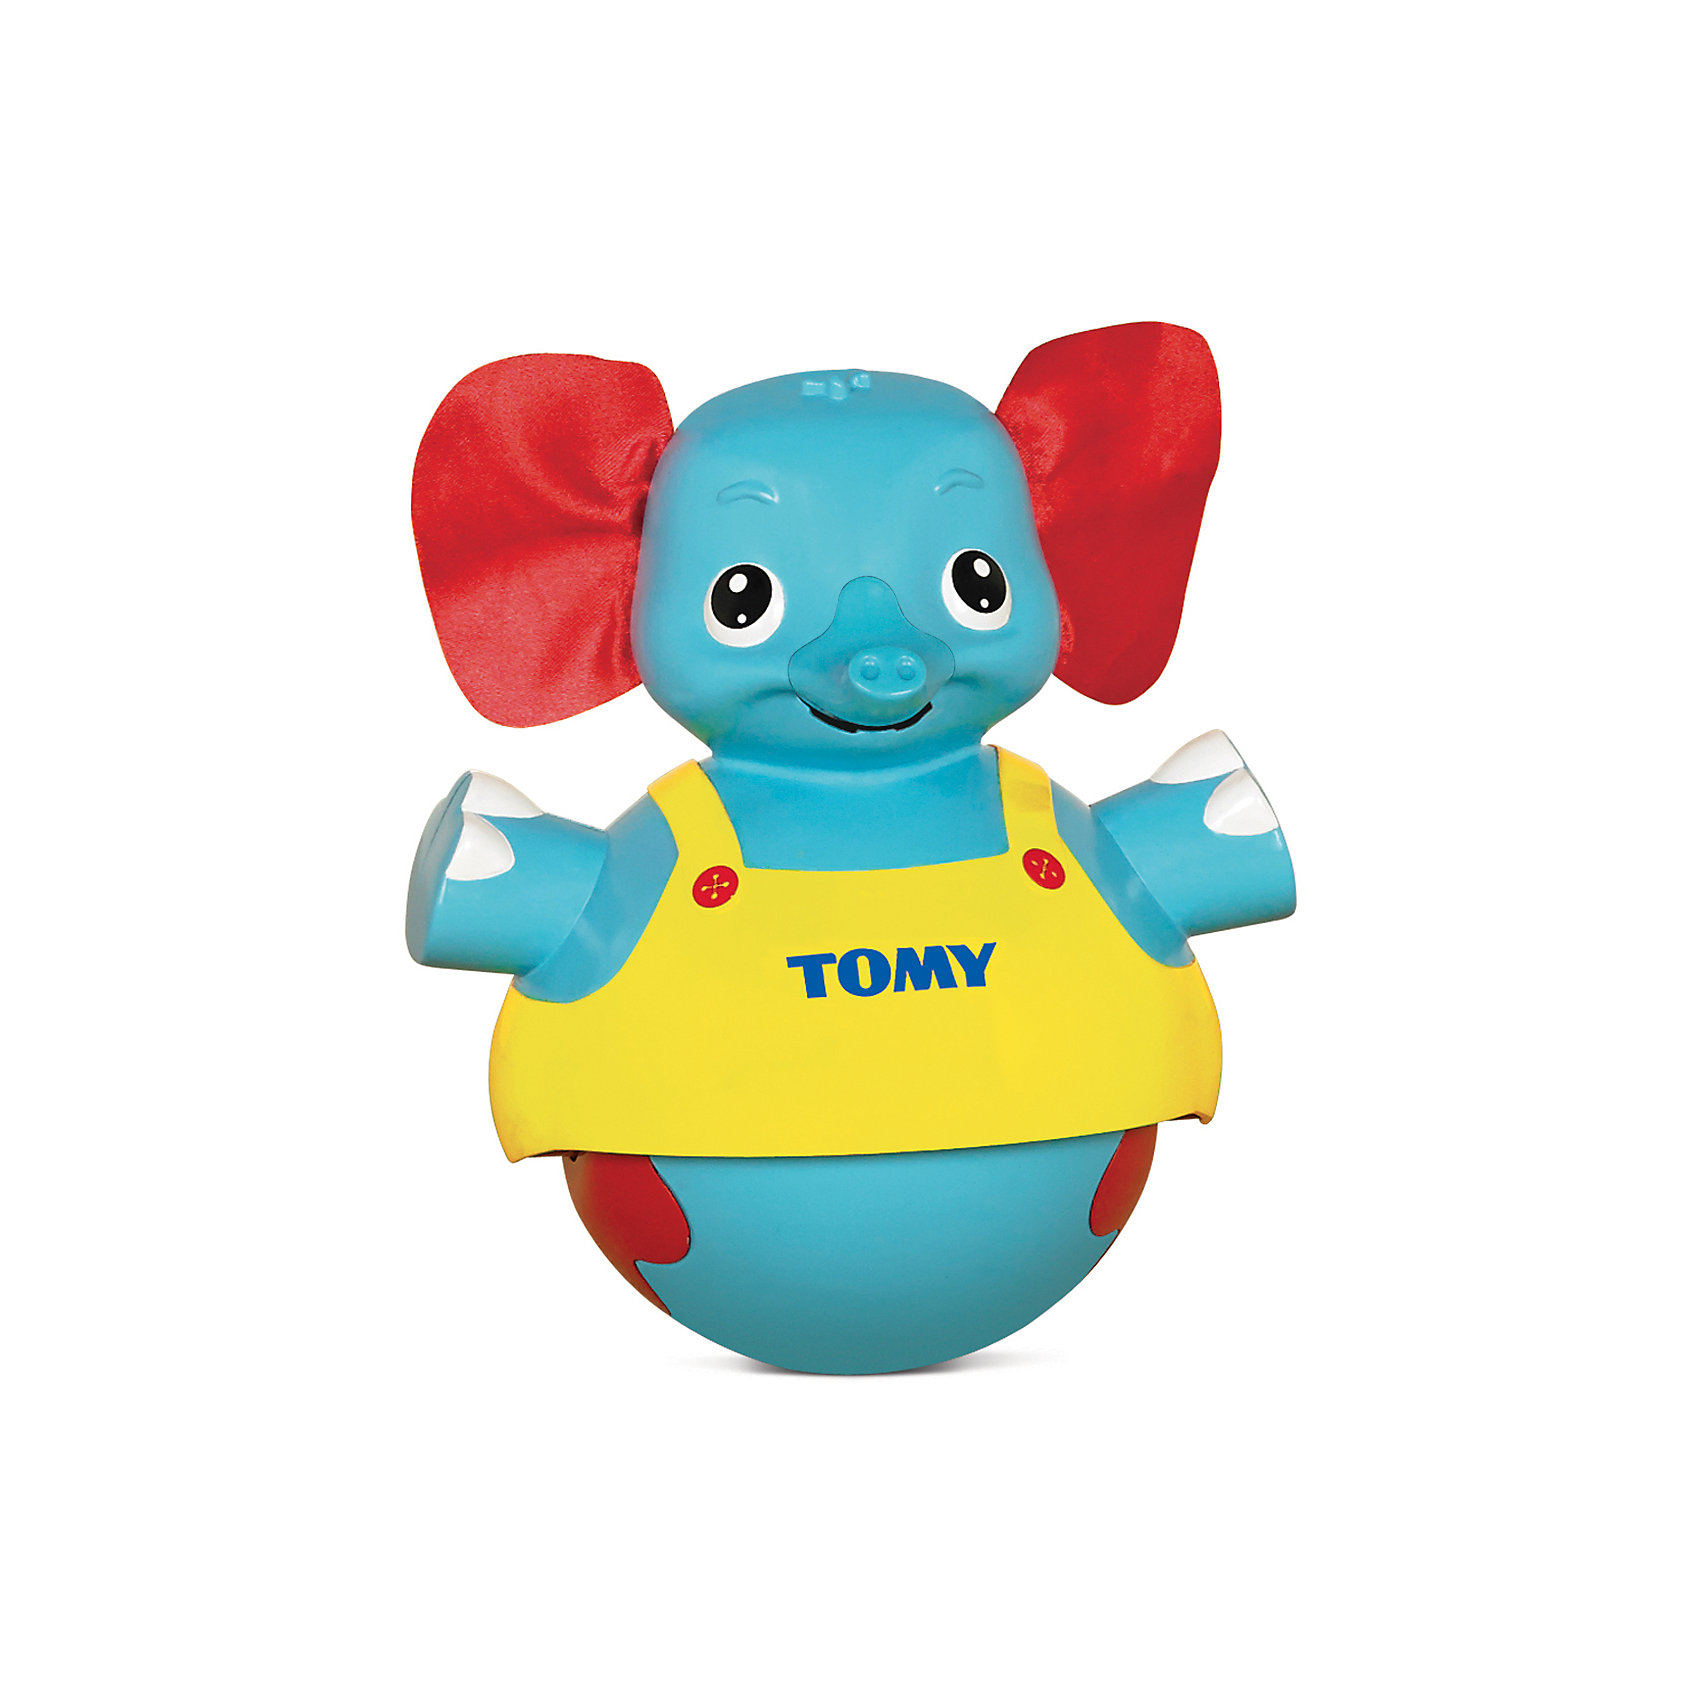 TOMY Неваляшка Слоник учится ходить, TOMY игрушки интерактивные tomy интерактивная игрушка слоник учится ходить